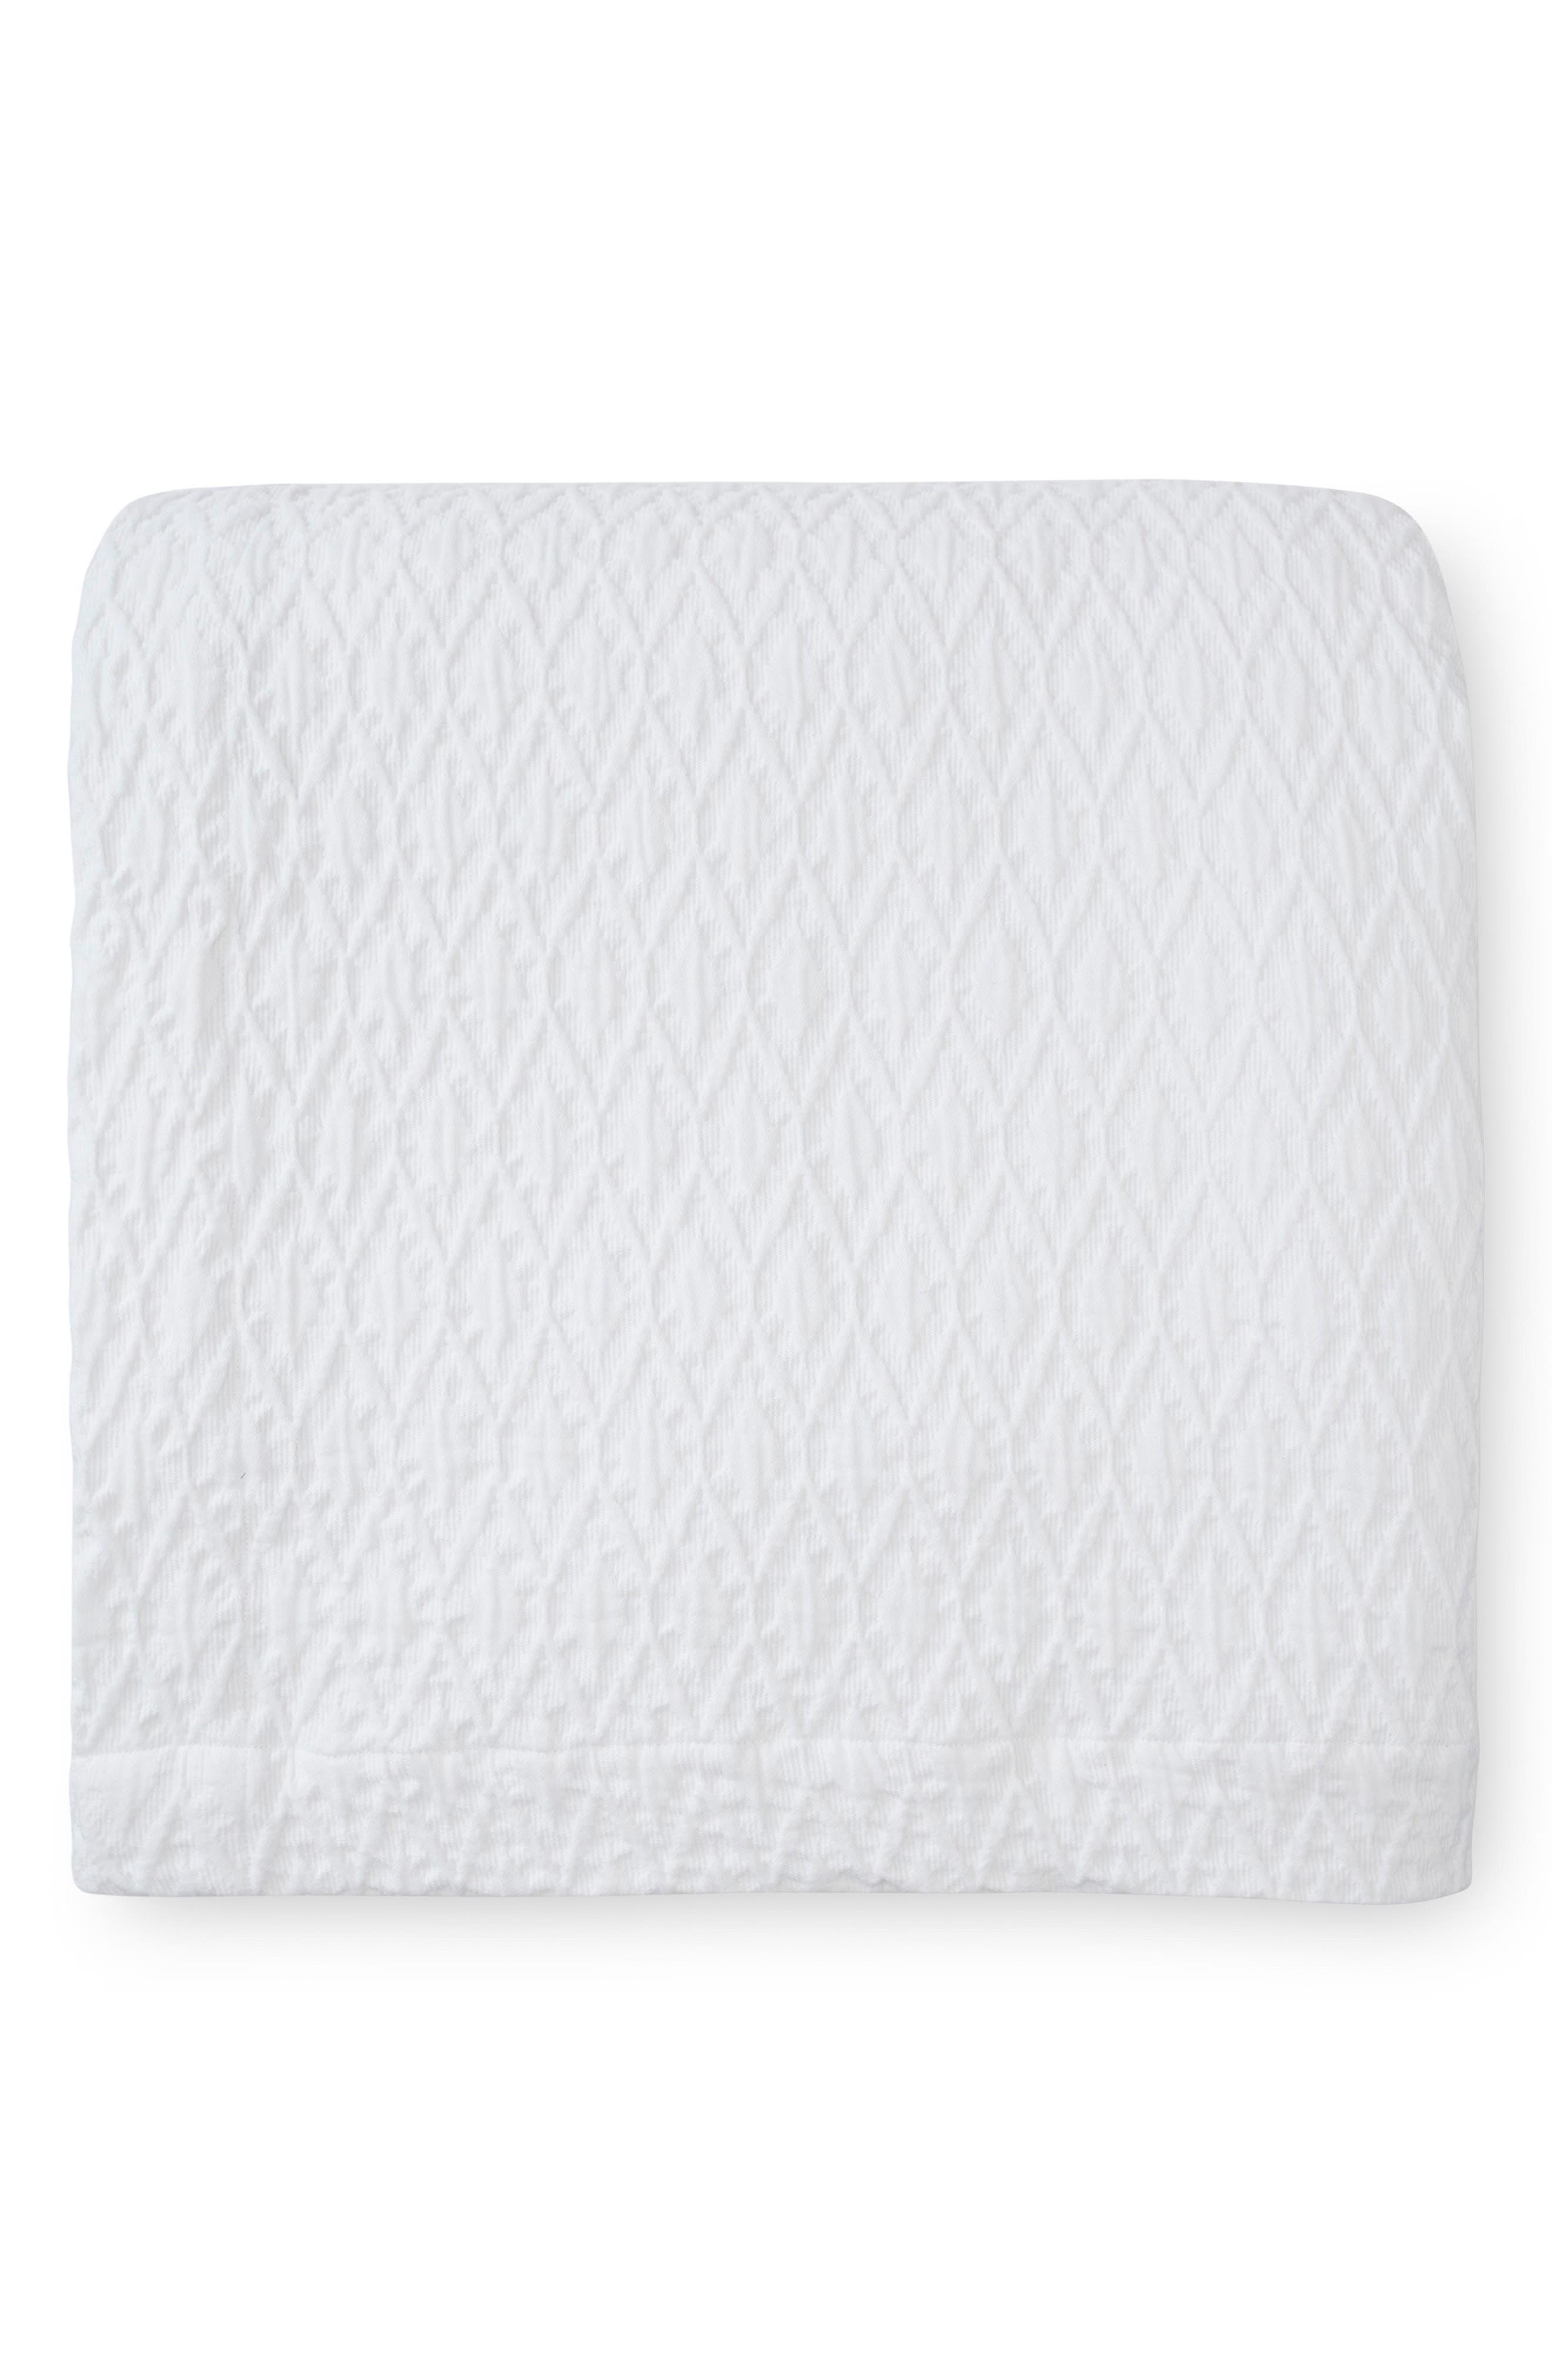 Tanlia Blanket,                         Main,                         color, 100